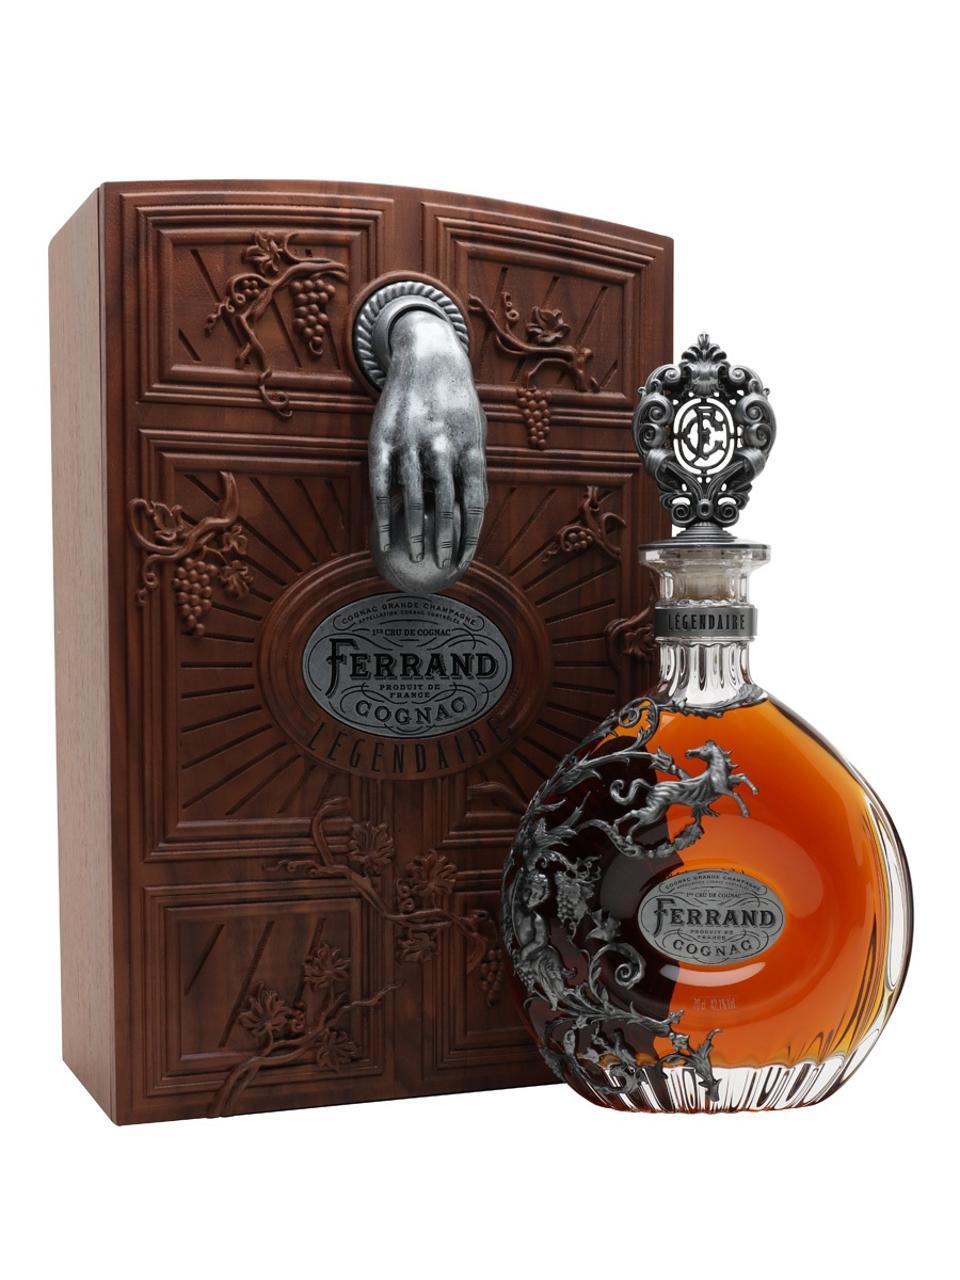 Ferrand, Legendaire Cognac